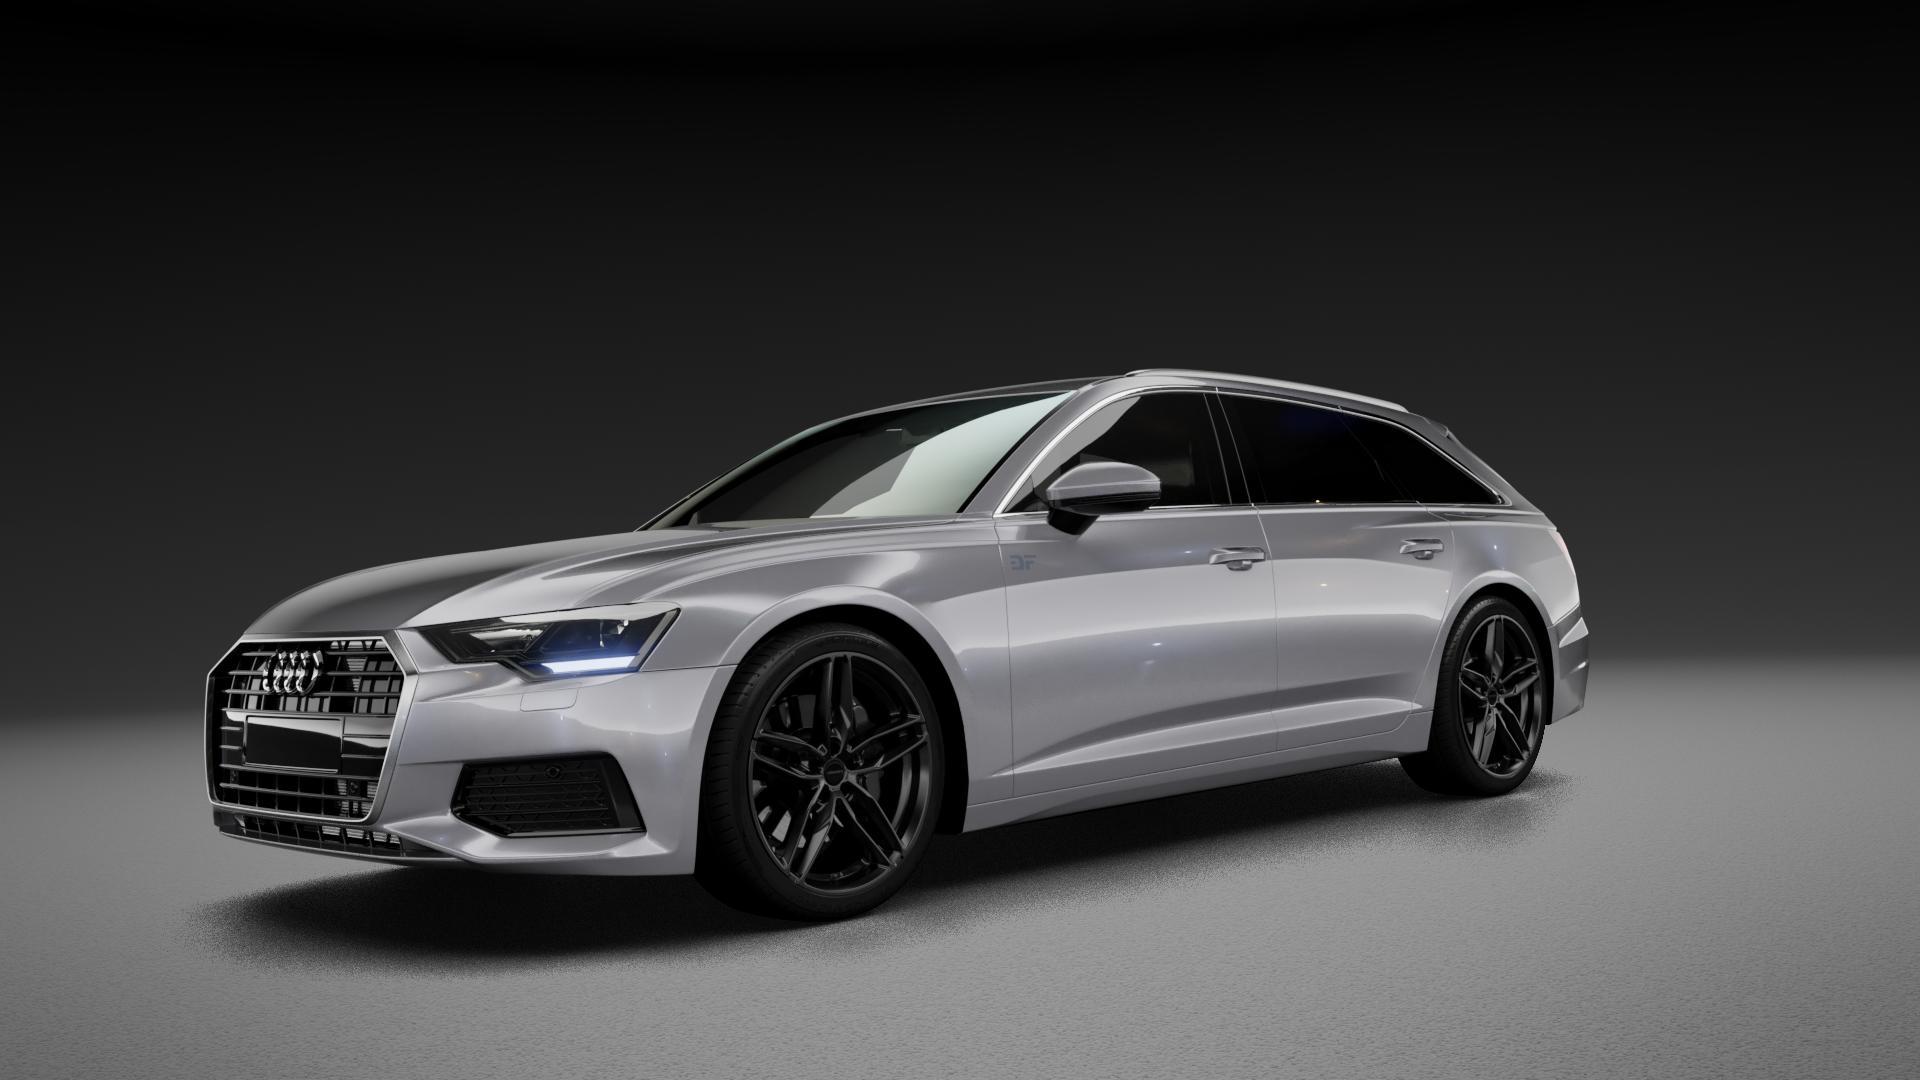 CARMANI 13 Twinmax black Felge mit Reifen schwarz in 20Zoll Winterfelge Alufelge auf silbernem Audi A6 Typ F2/C8 (Avant) 3,0l 45 TDI quattro 170kW Mild-Hybrid (231 PS) 50 210kW (286 55 TFSI 250kW (340 2,0l 40 150kW (204 155kW (211 180kW (245 35 120kW (163 S6 257kW (349 30 100kW (136 ⬇️ mit 15mm Tieferlegung ⬇️ Neutral_mid_max5300mm Fr